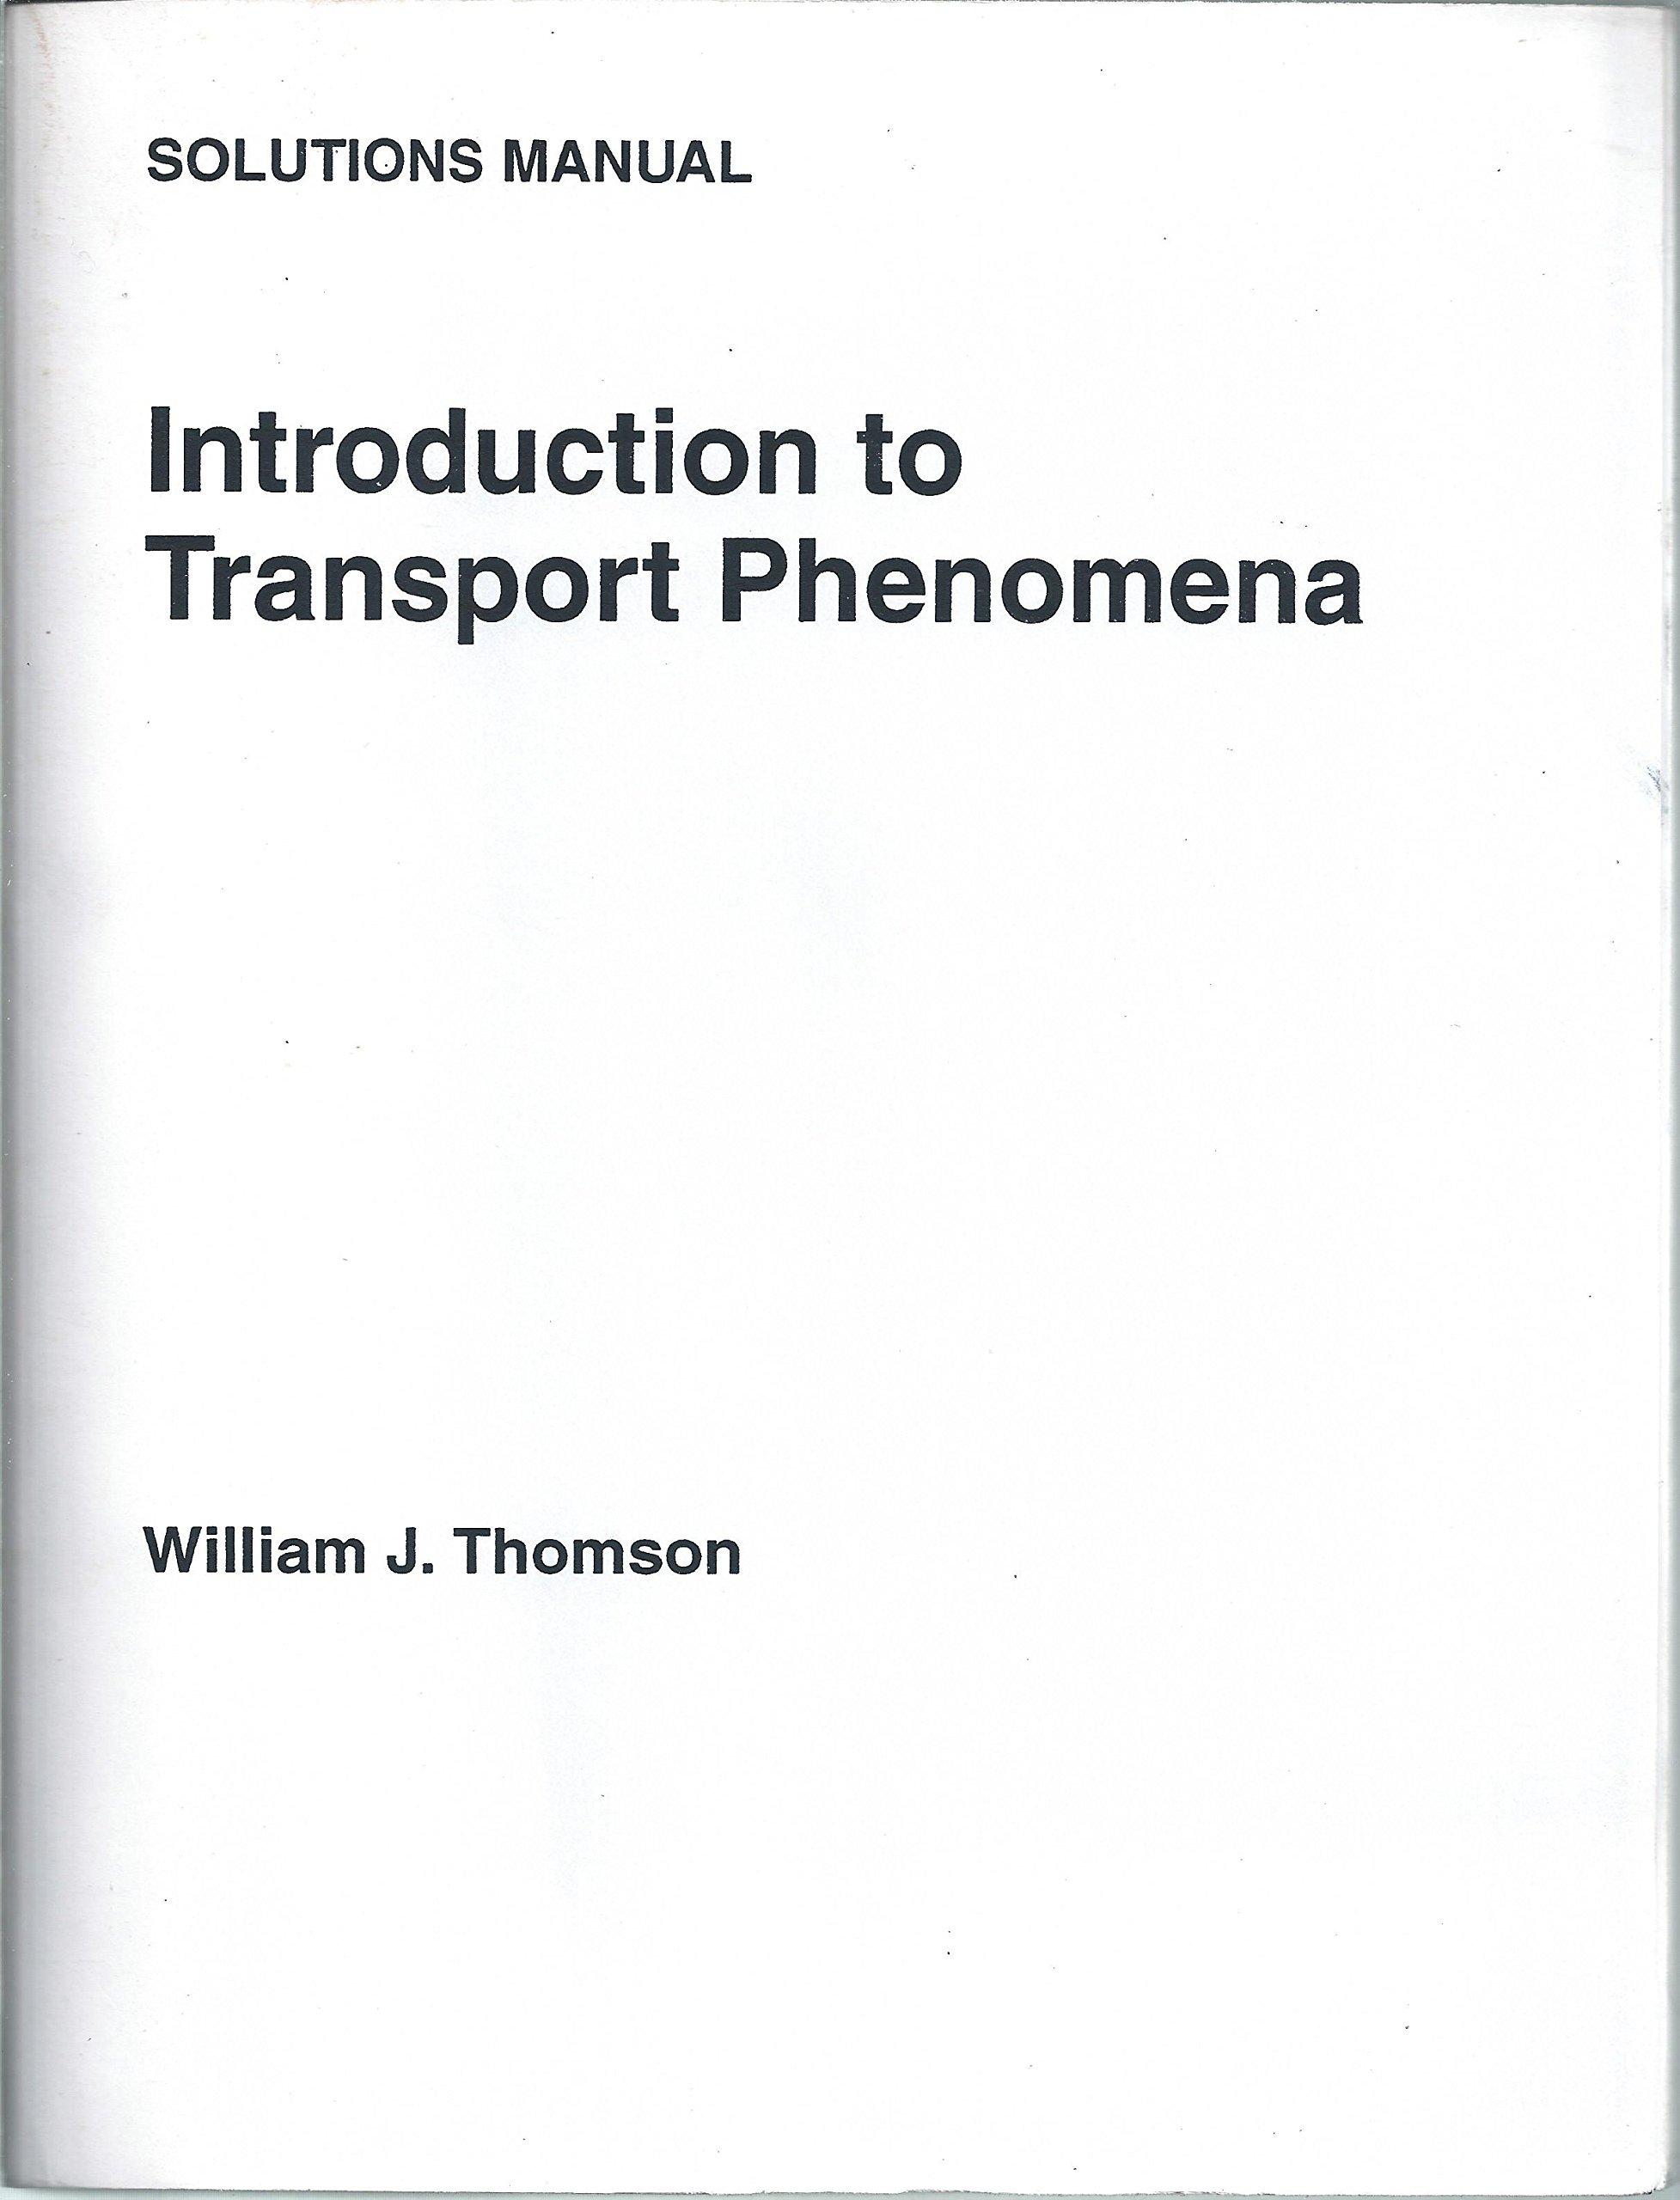 Solutions Manual: Mike Woodring, William Thomson: 9780130192349:  Amazon.com: Books